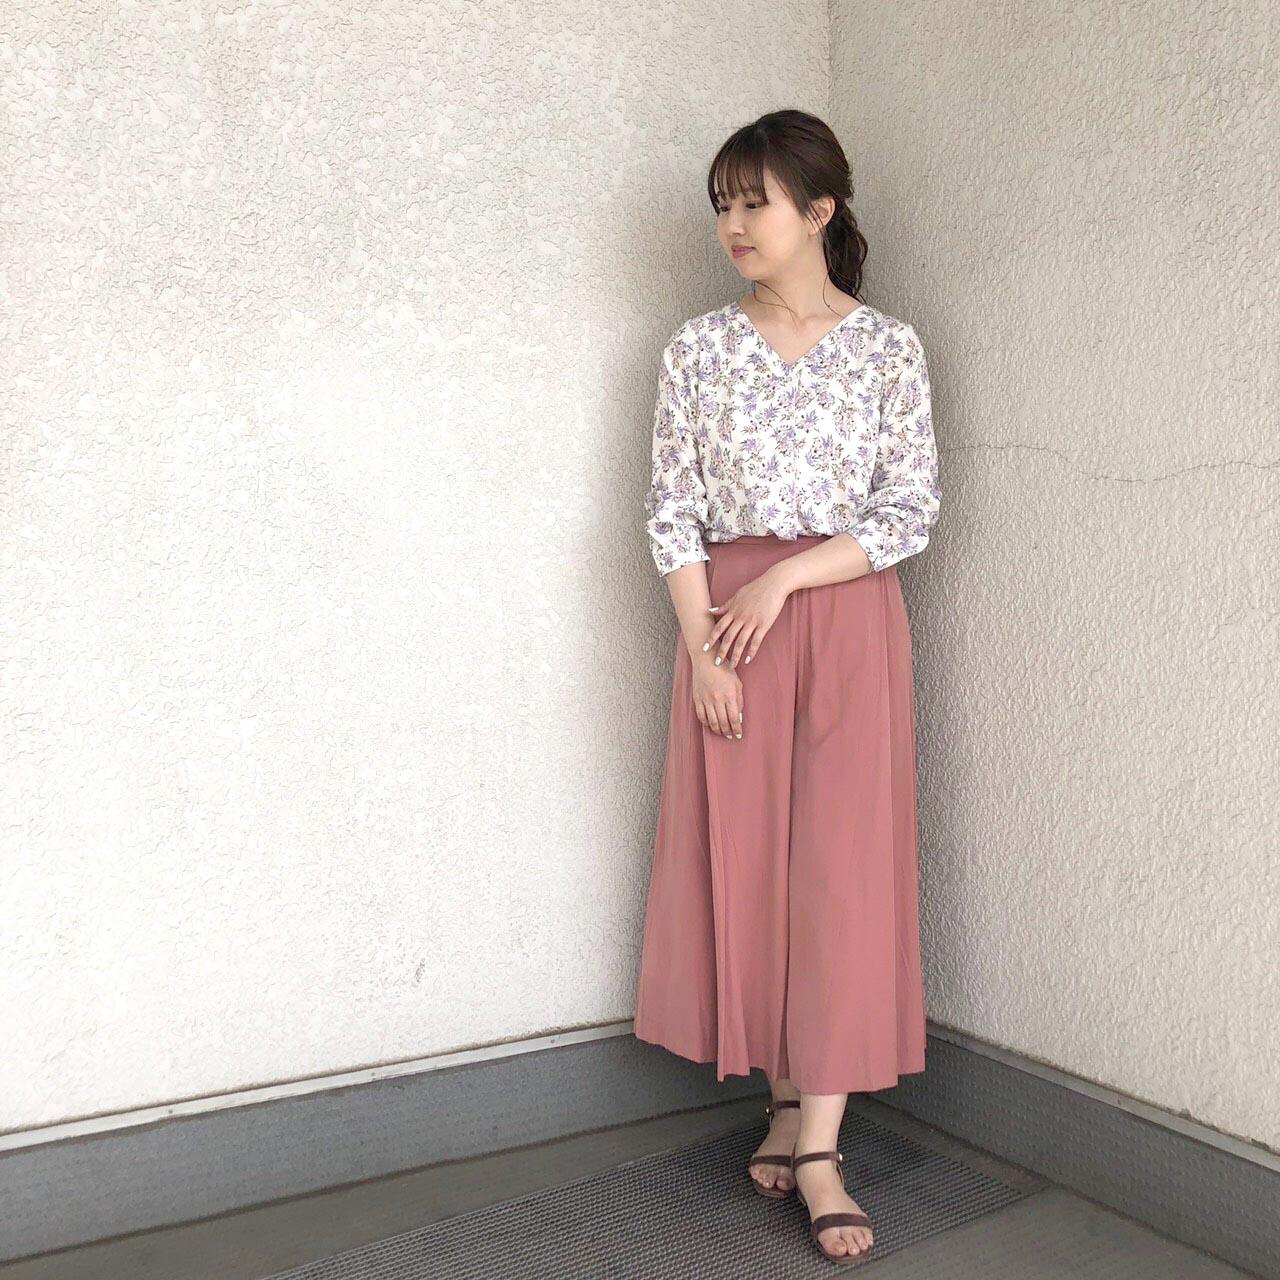 Vネックフラワープリントブラウス&ビンテージサテンフレアパンツ・荻窪店